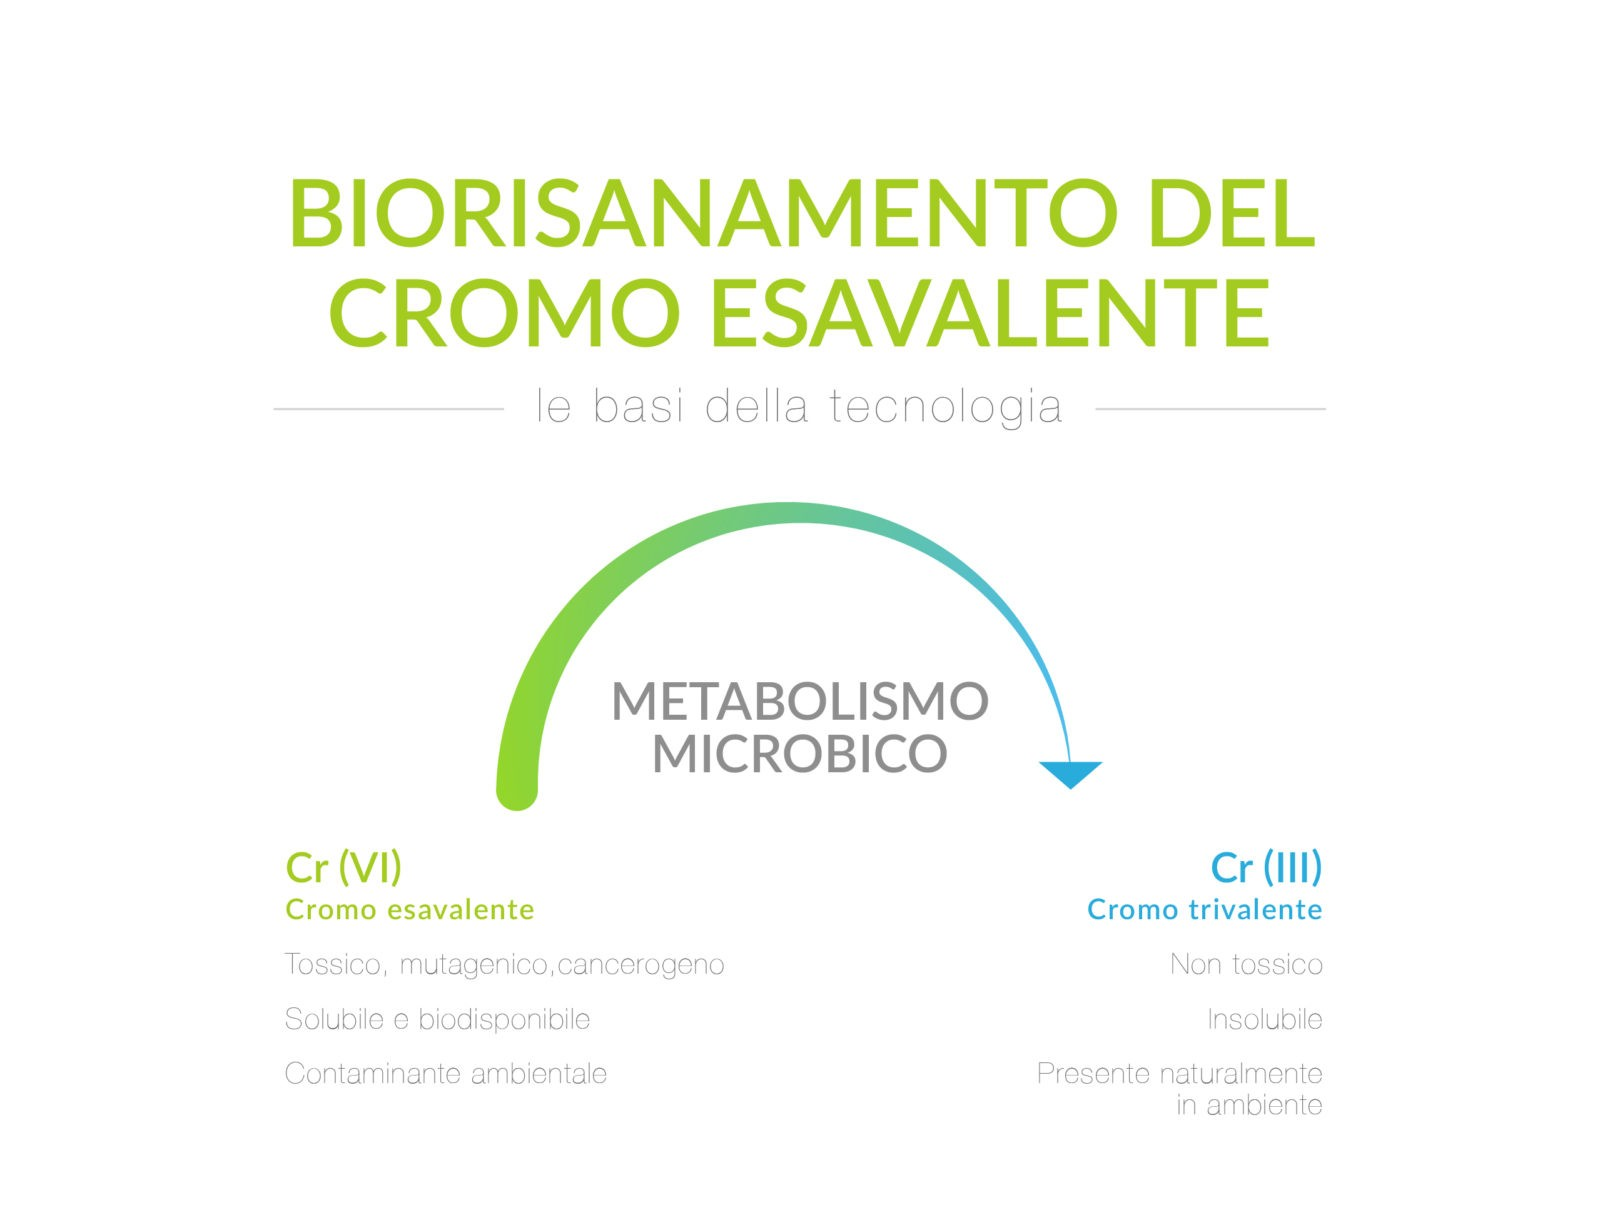 Biorisanamento Cromo esavalente